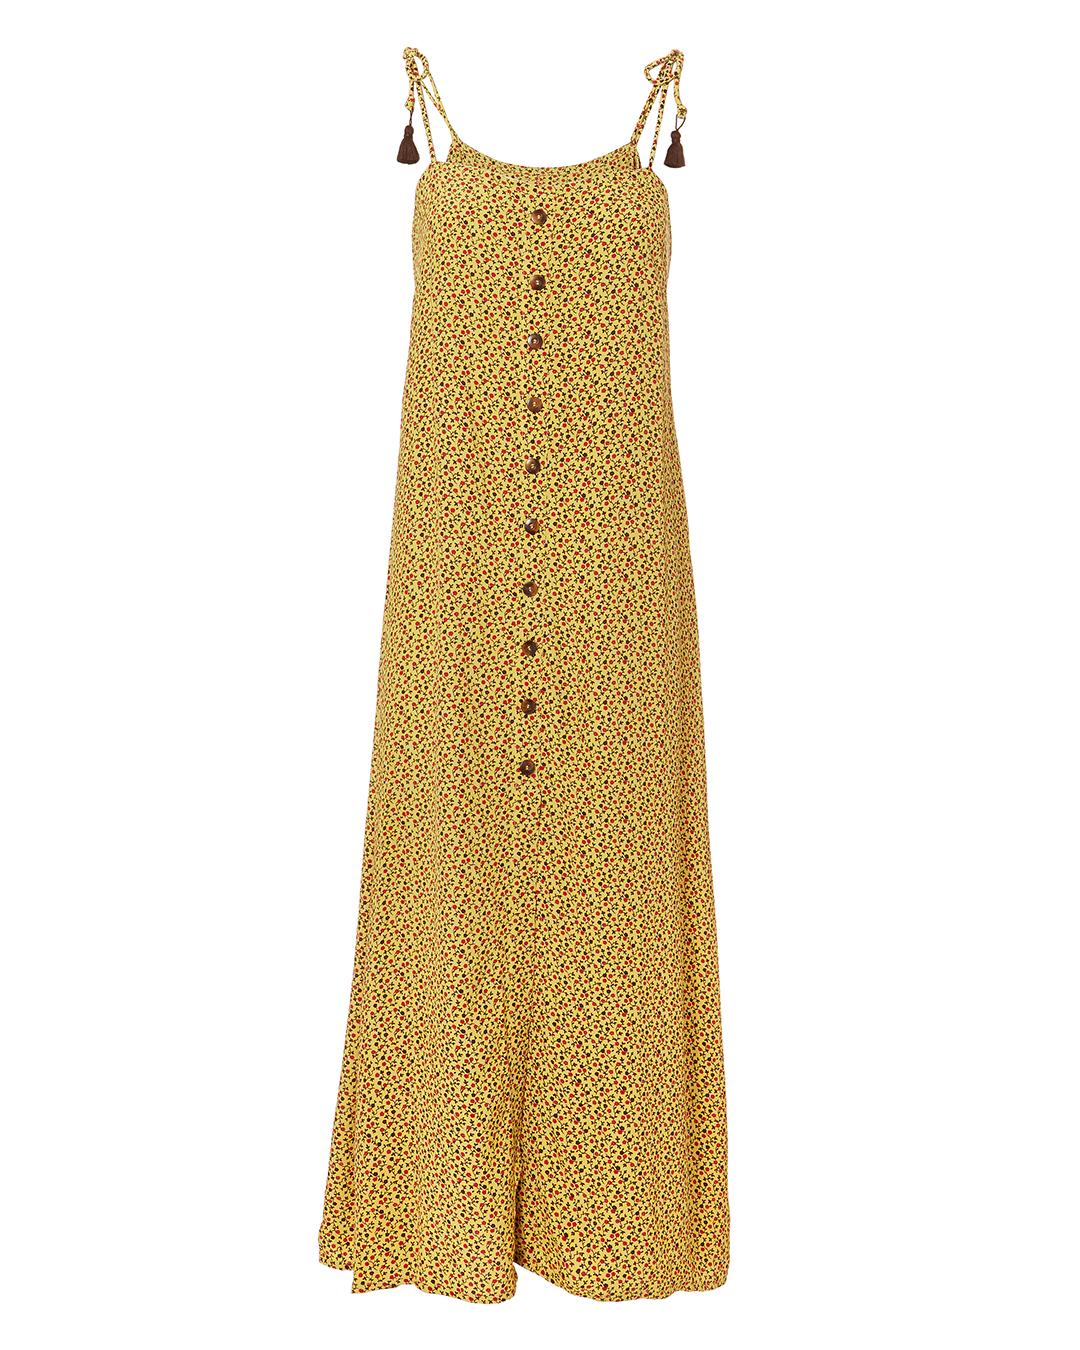 Arrieta Dress